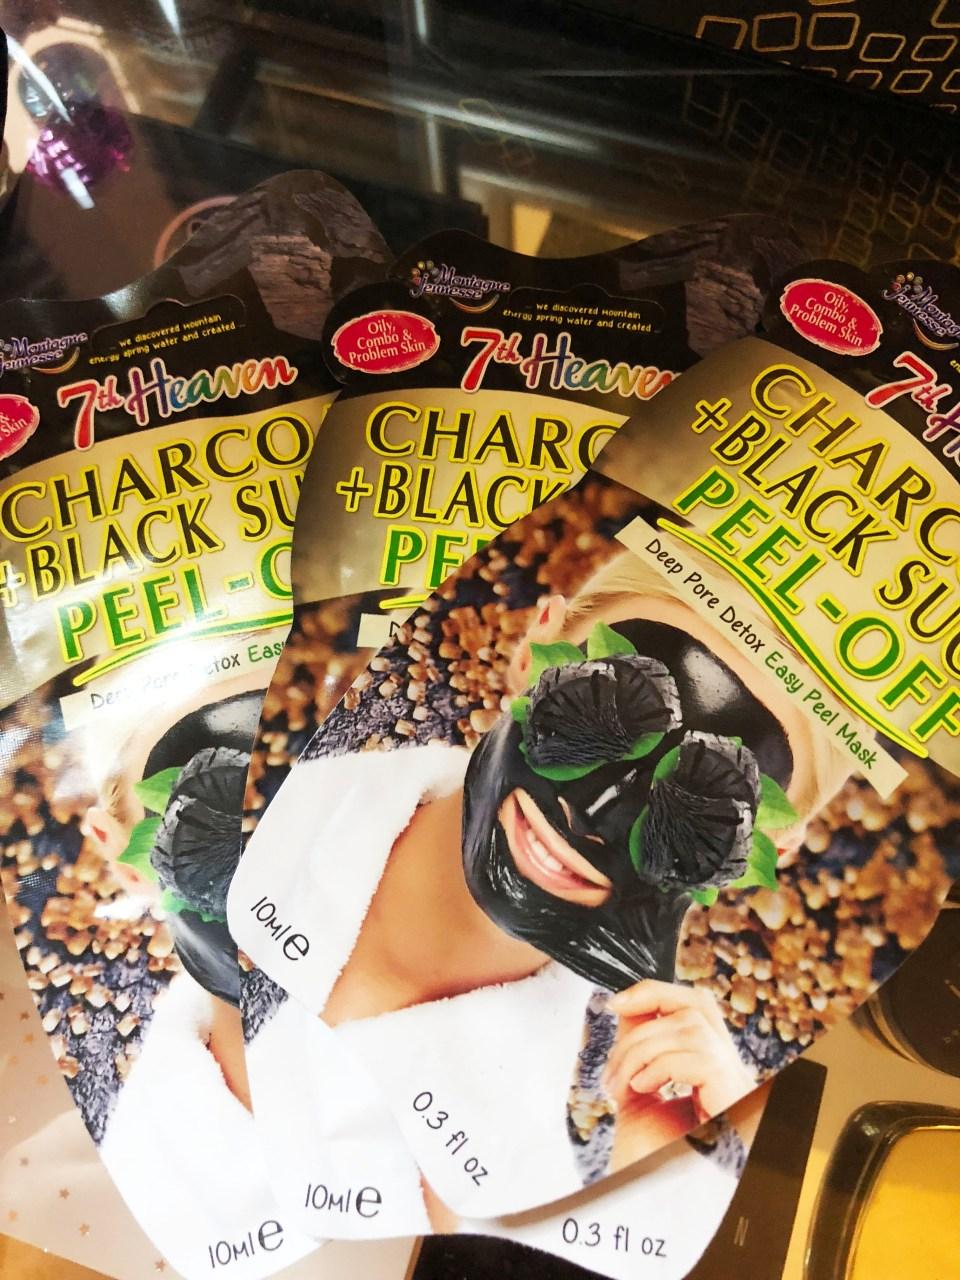 Charcoal & Black Sugar Peel-Off Mask